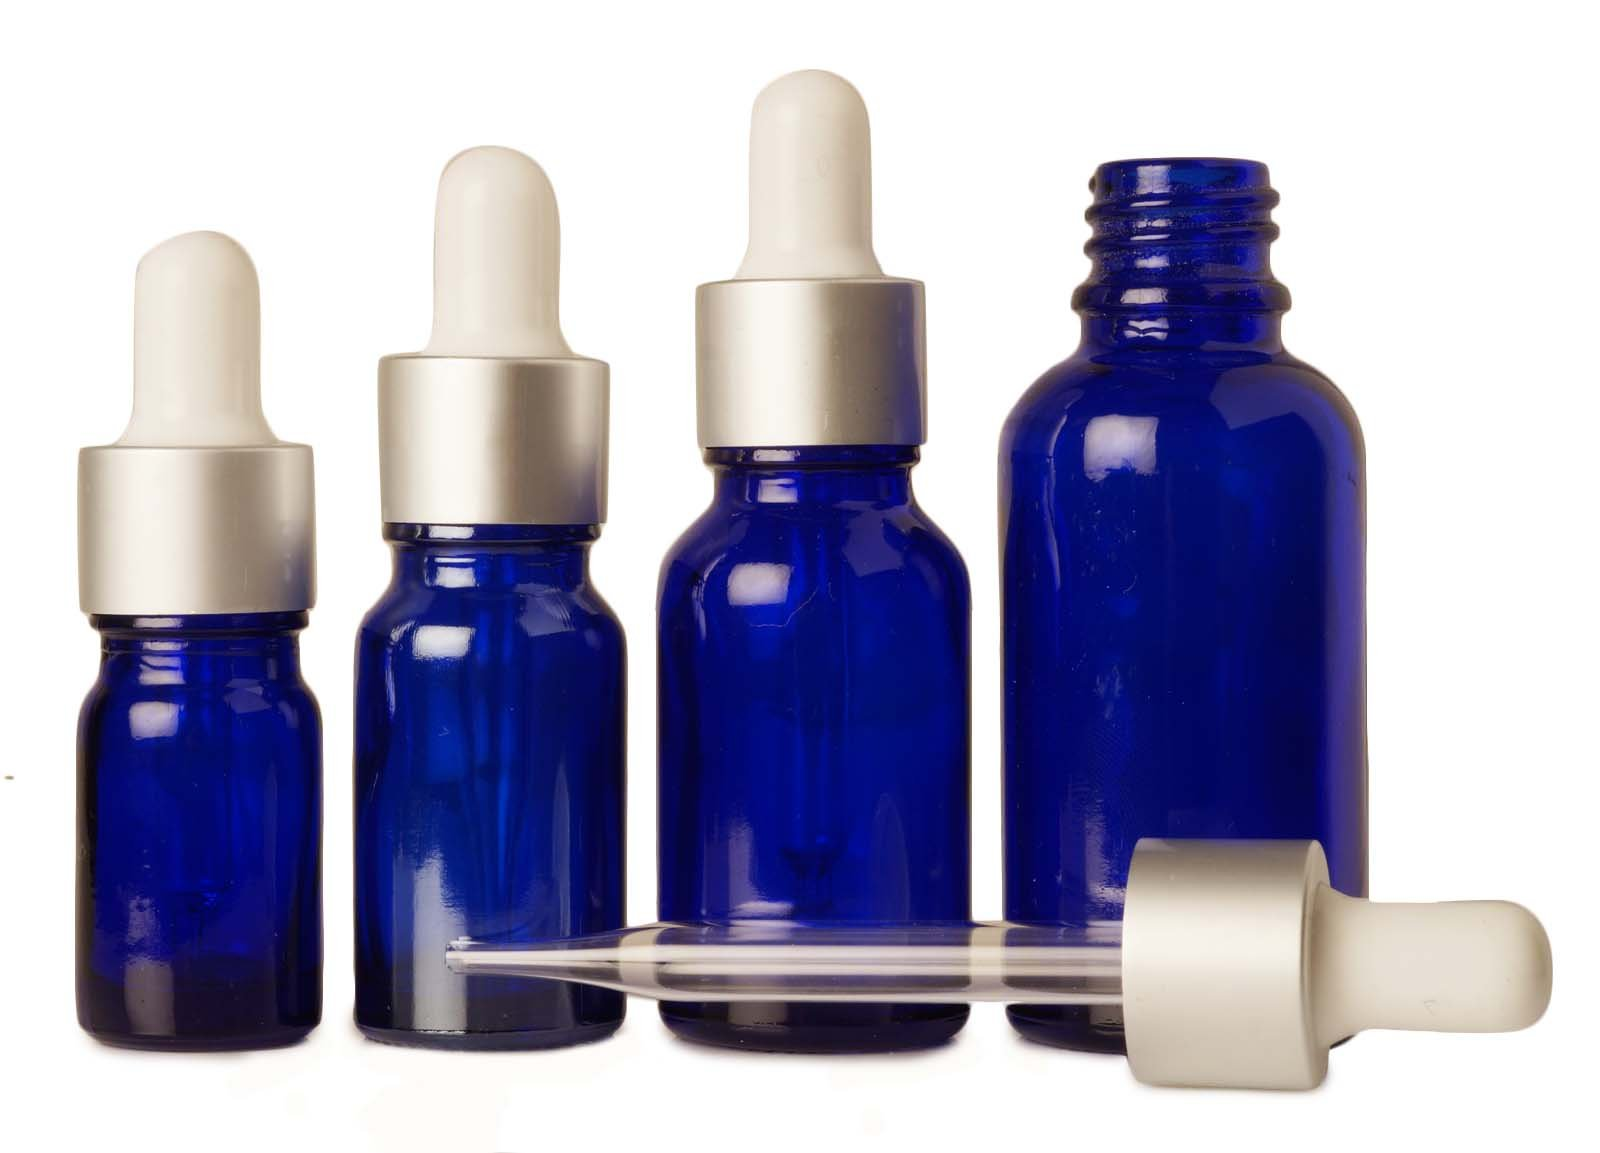 100 Piece Empty Cobalt Blue Glass Eye Dropper Bottle Boston Round Wholesale Bottles Aromatherapy Oils Refillable Pipette Drop Vials 10 ml